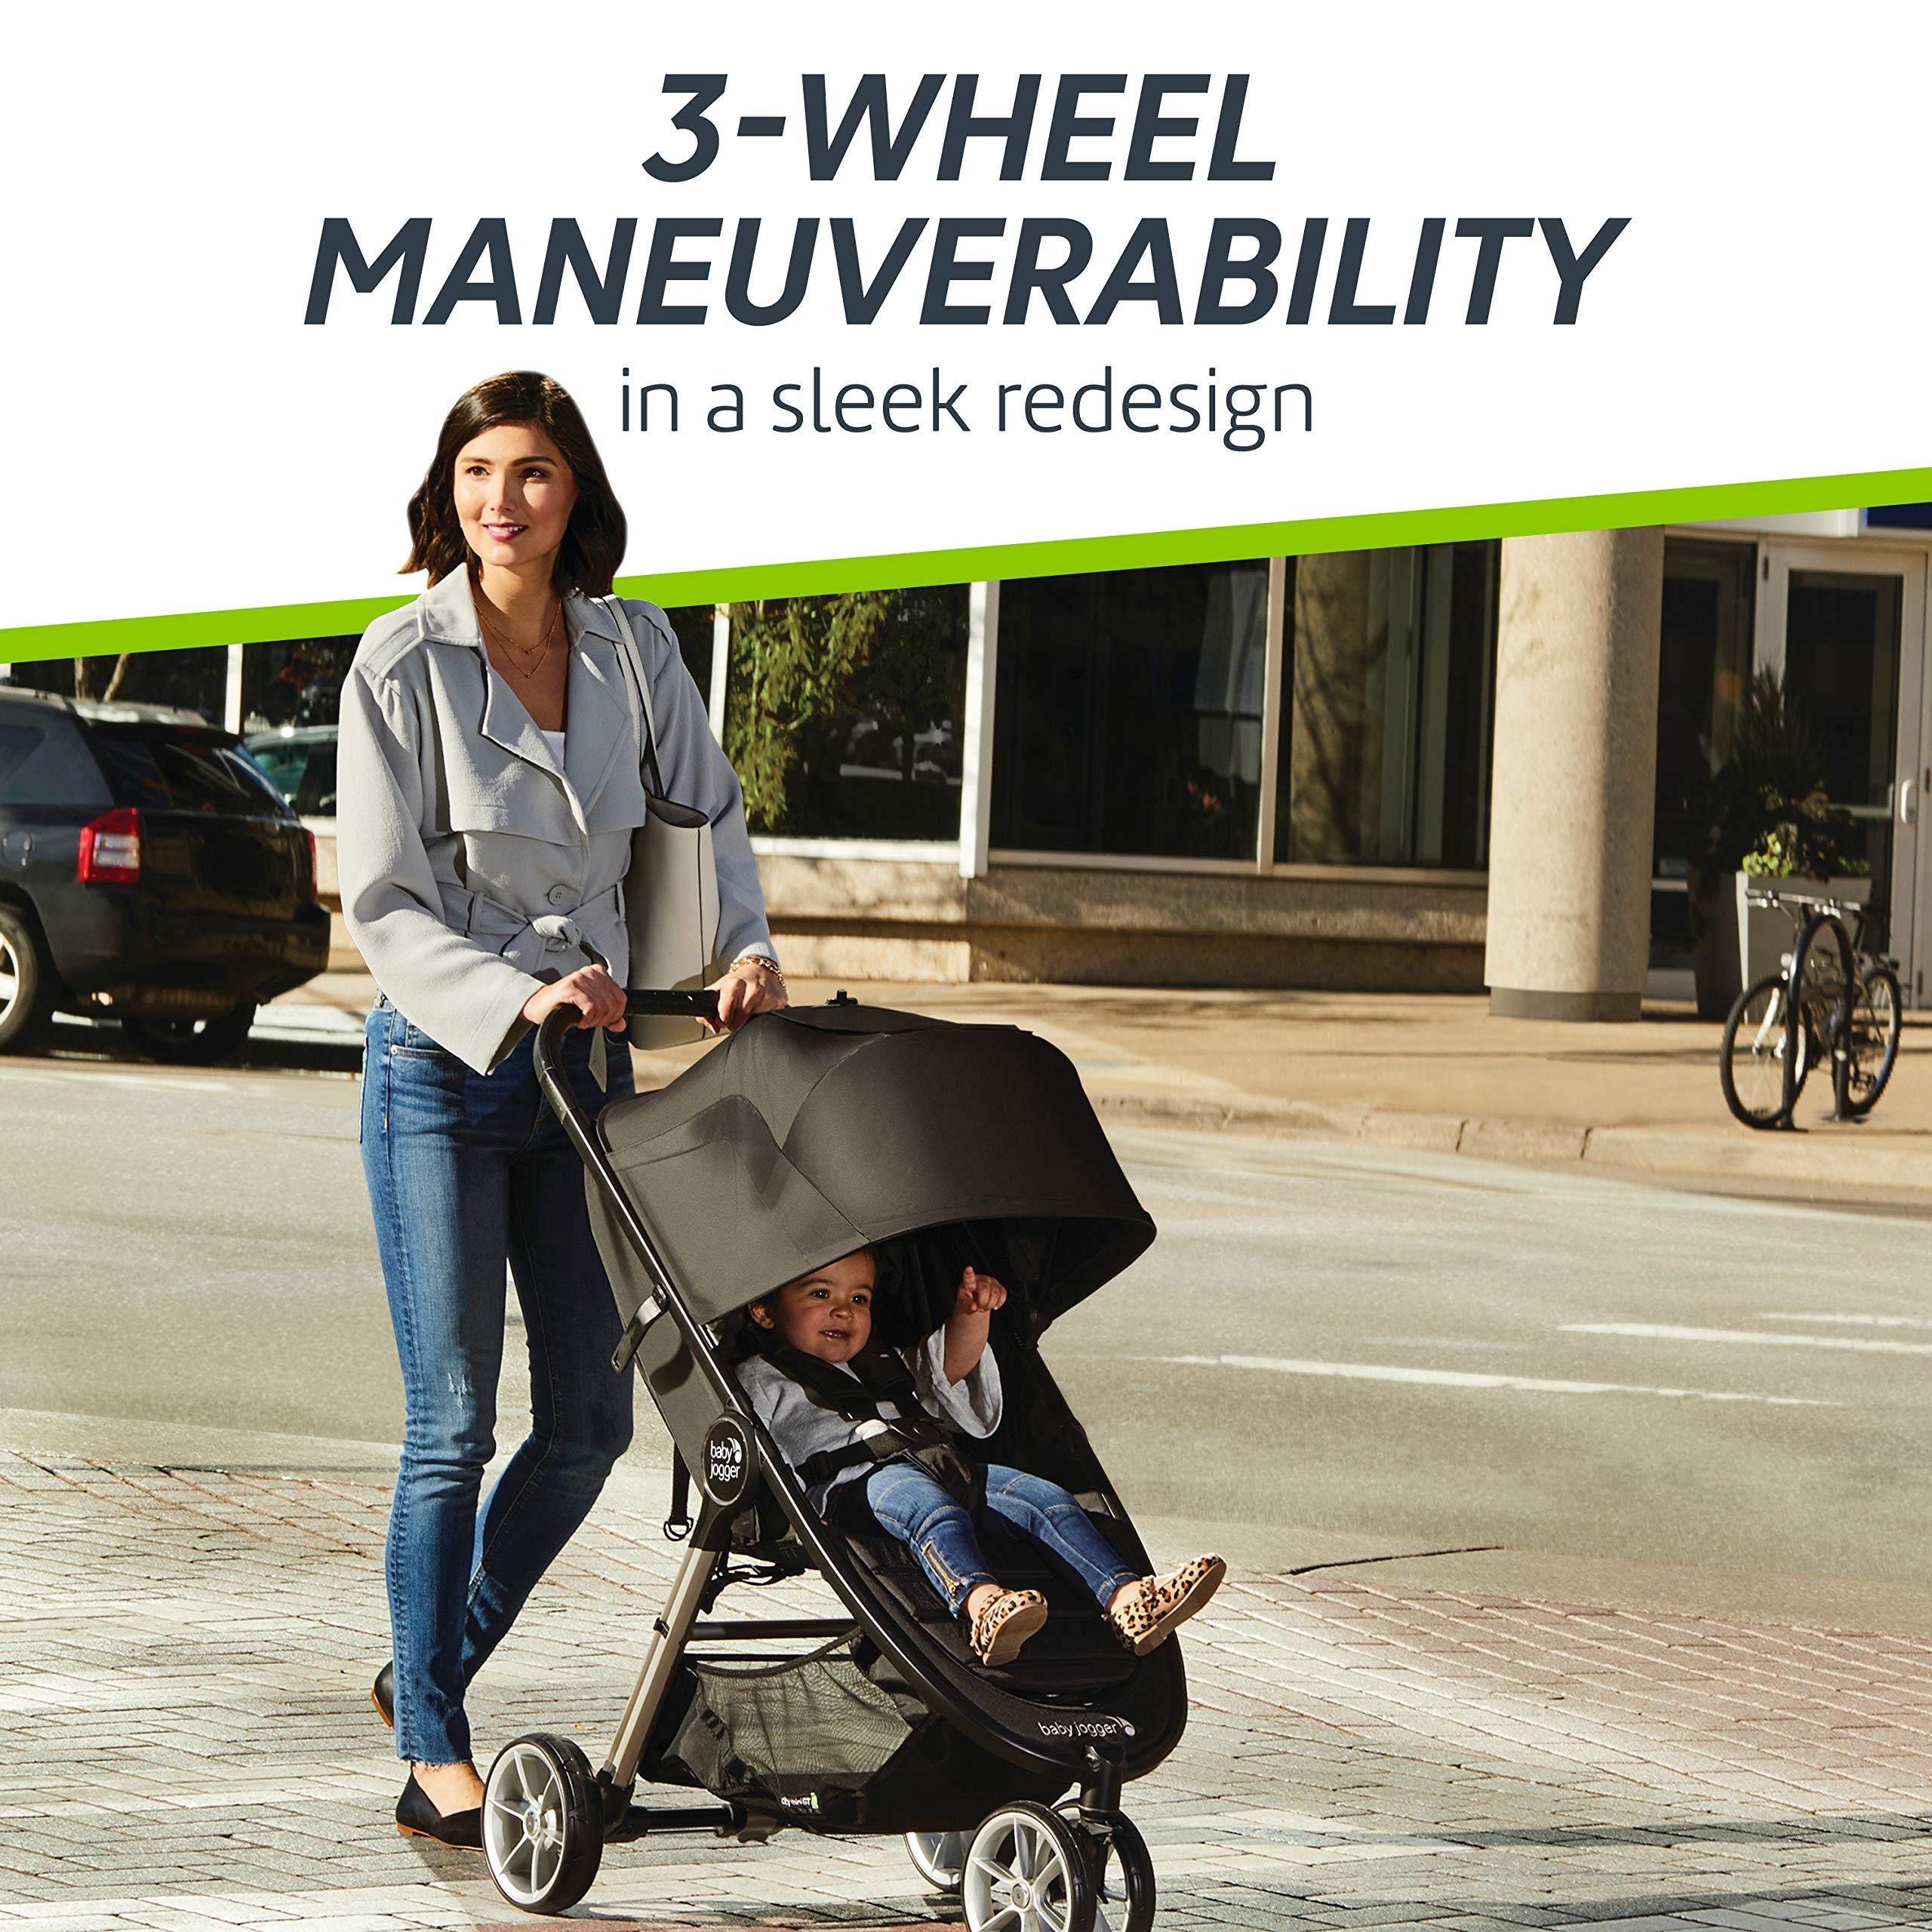 Baby Jogger City Mini 2 Stroller - 2019   Compact, Lightweight Stroller   Quick Fold Baby Stroller, Carbon by Baby Jogger (Image #3)